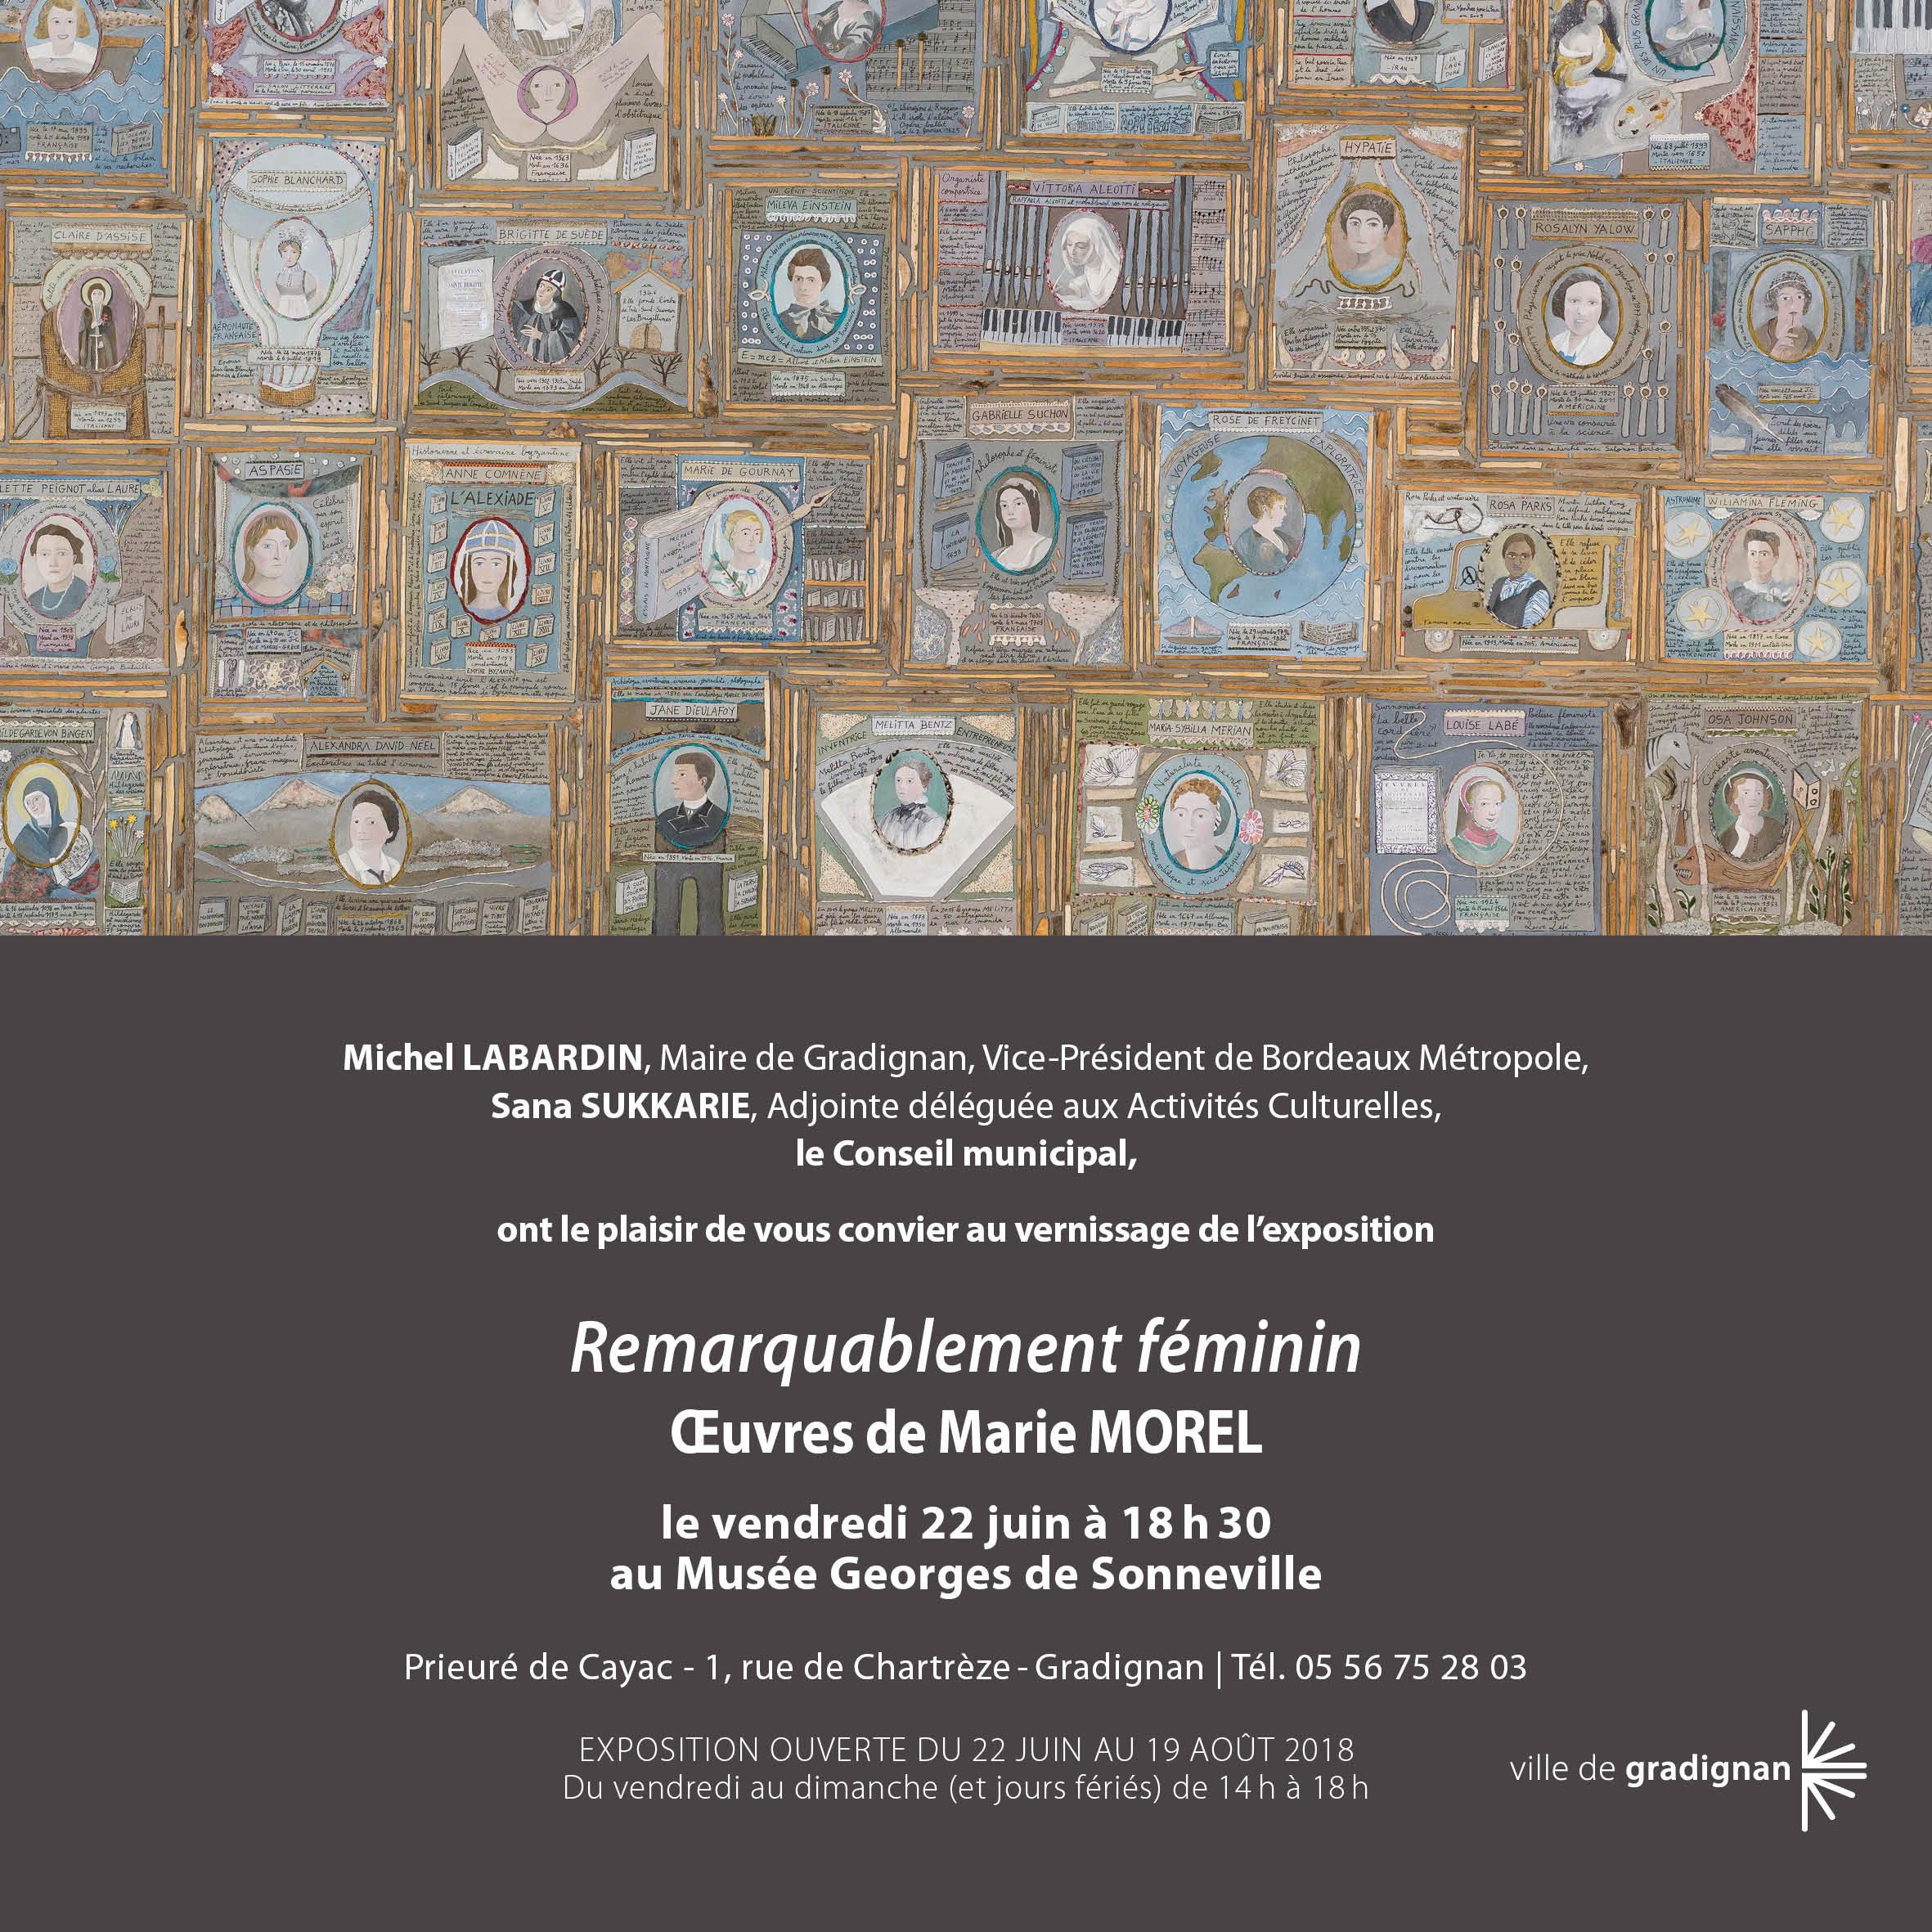 INVITATION-Marie-Morel_Remarquablement-feminin.jpg